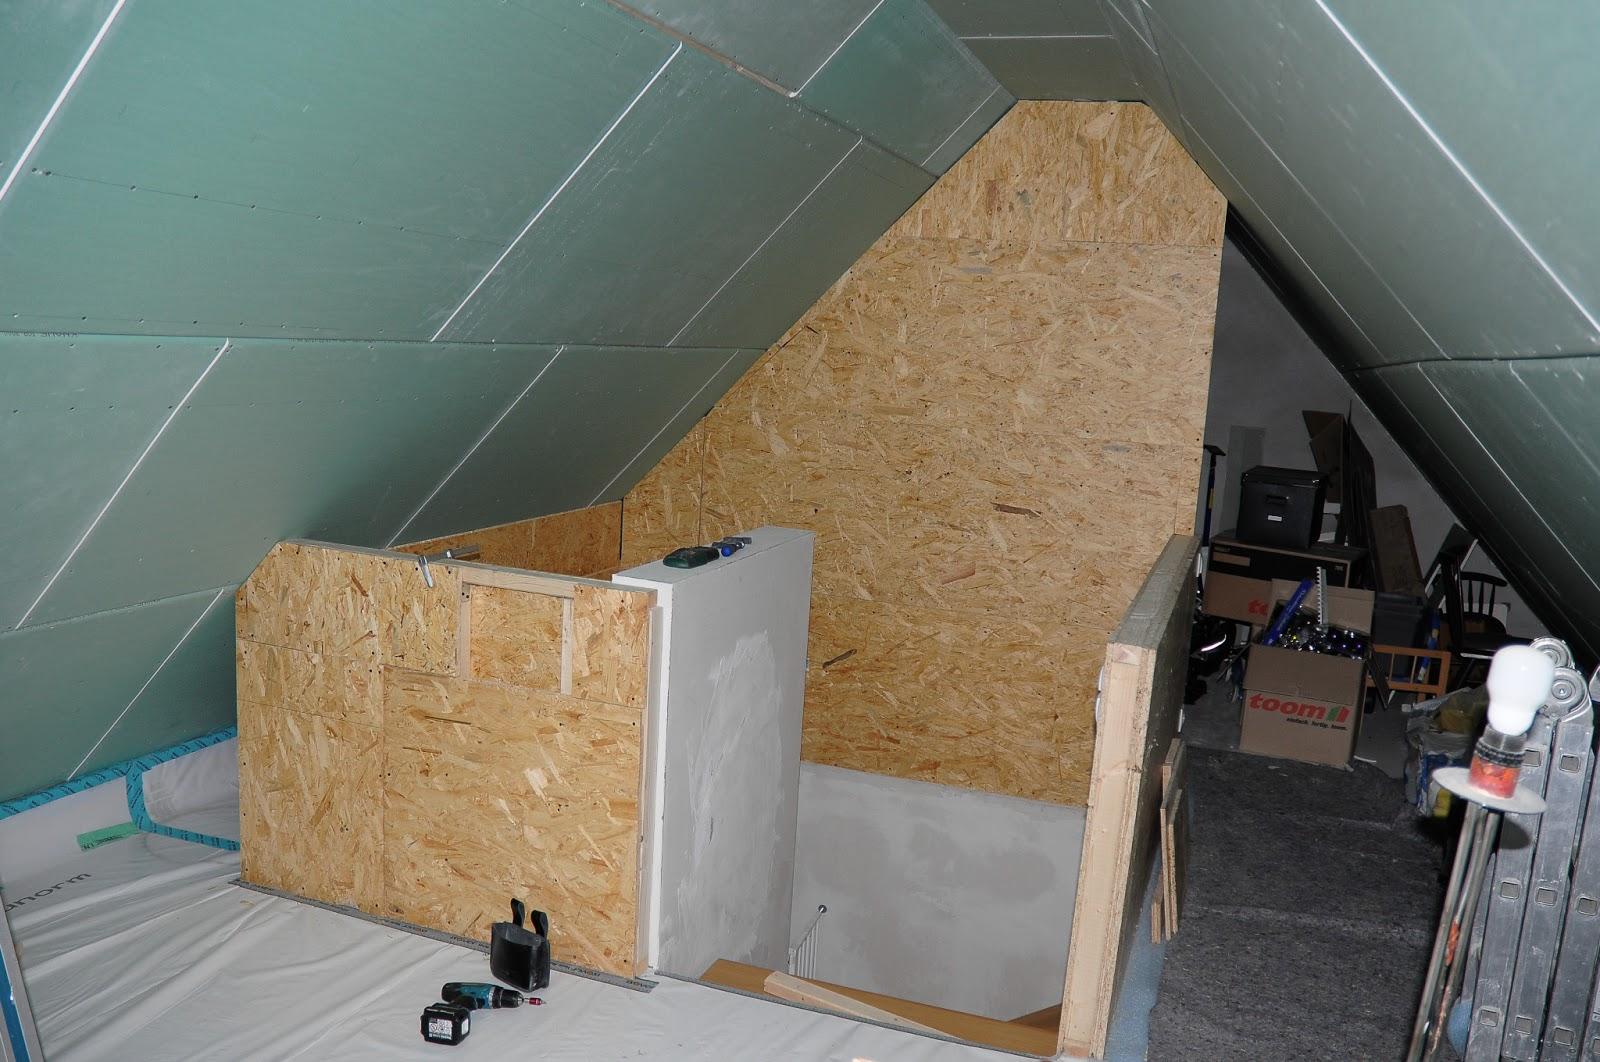 bauen in nrw mit norbert zielsdorf. Black Bedroom Furniture Sets. Home Design Ideas